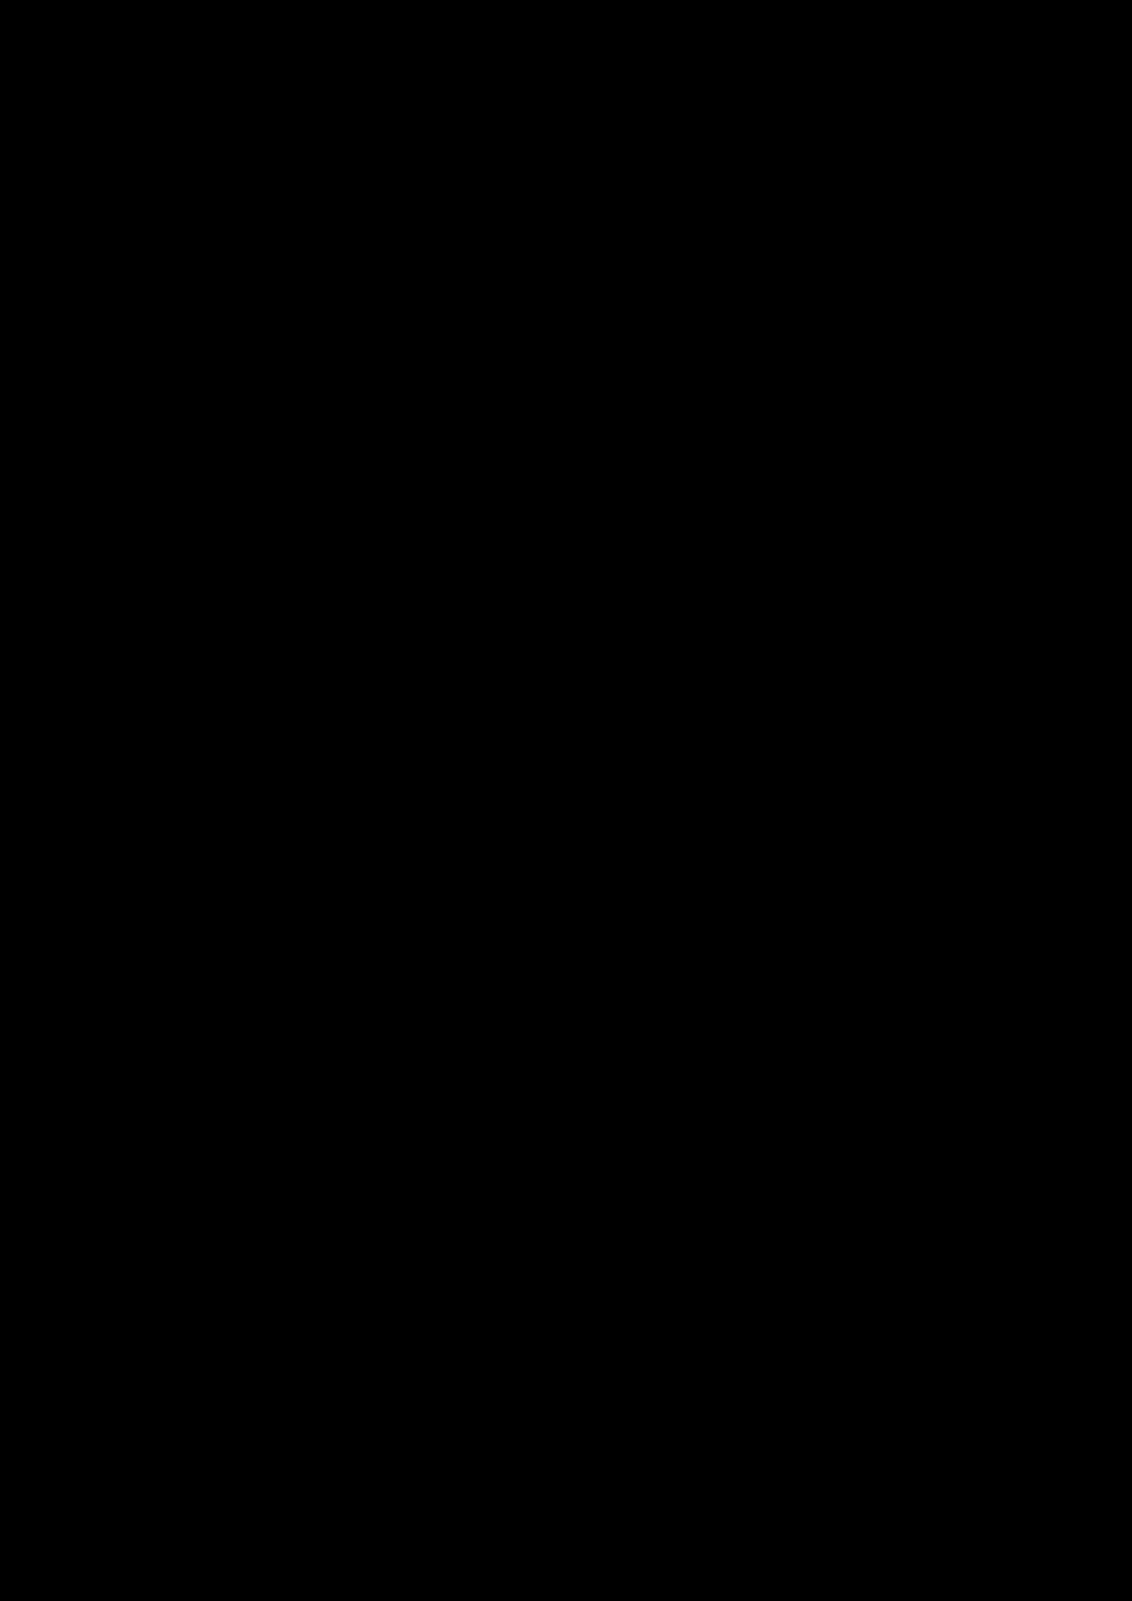 Ten lyubvi slide, Image 50